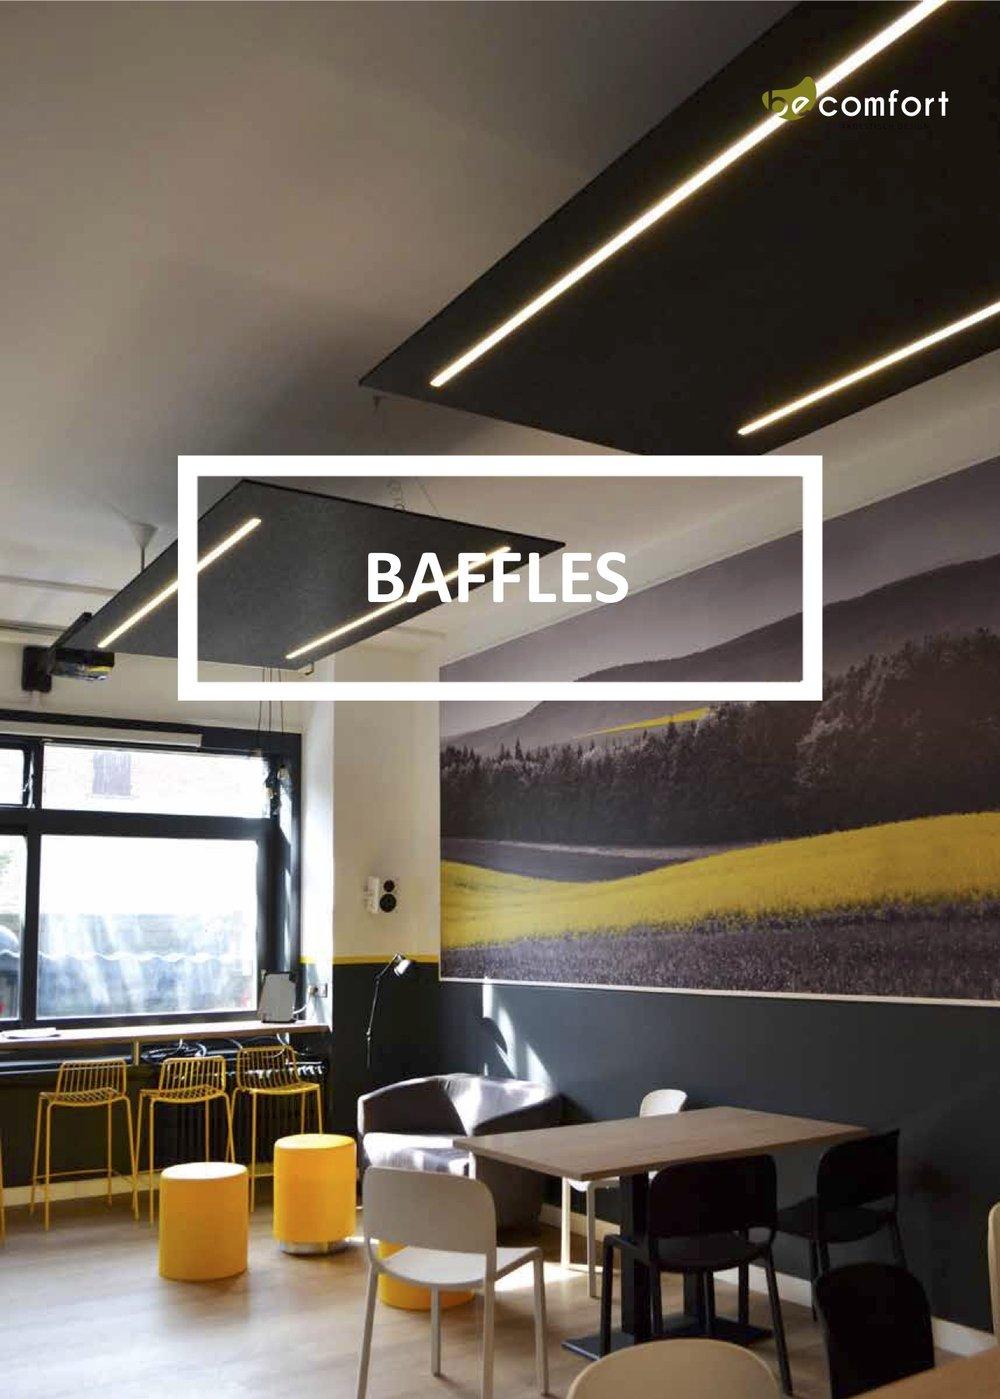 BeComfort Baffles sm.jpg